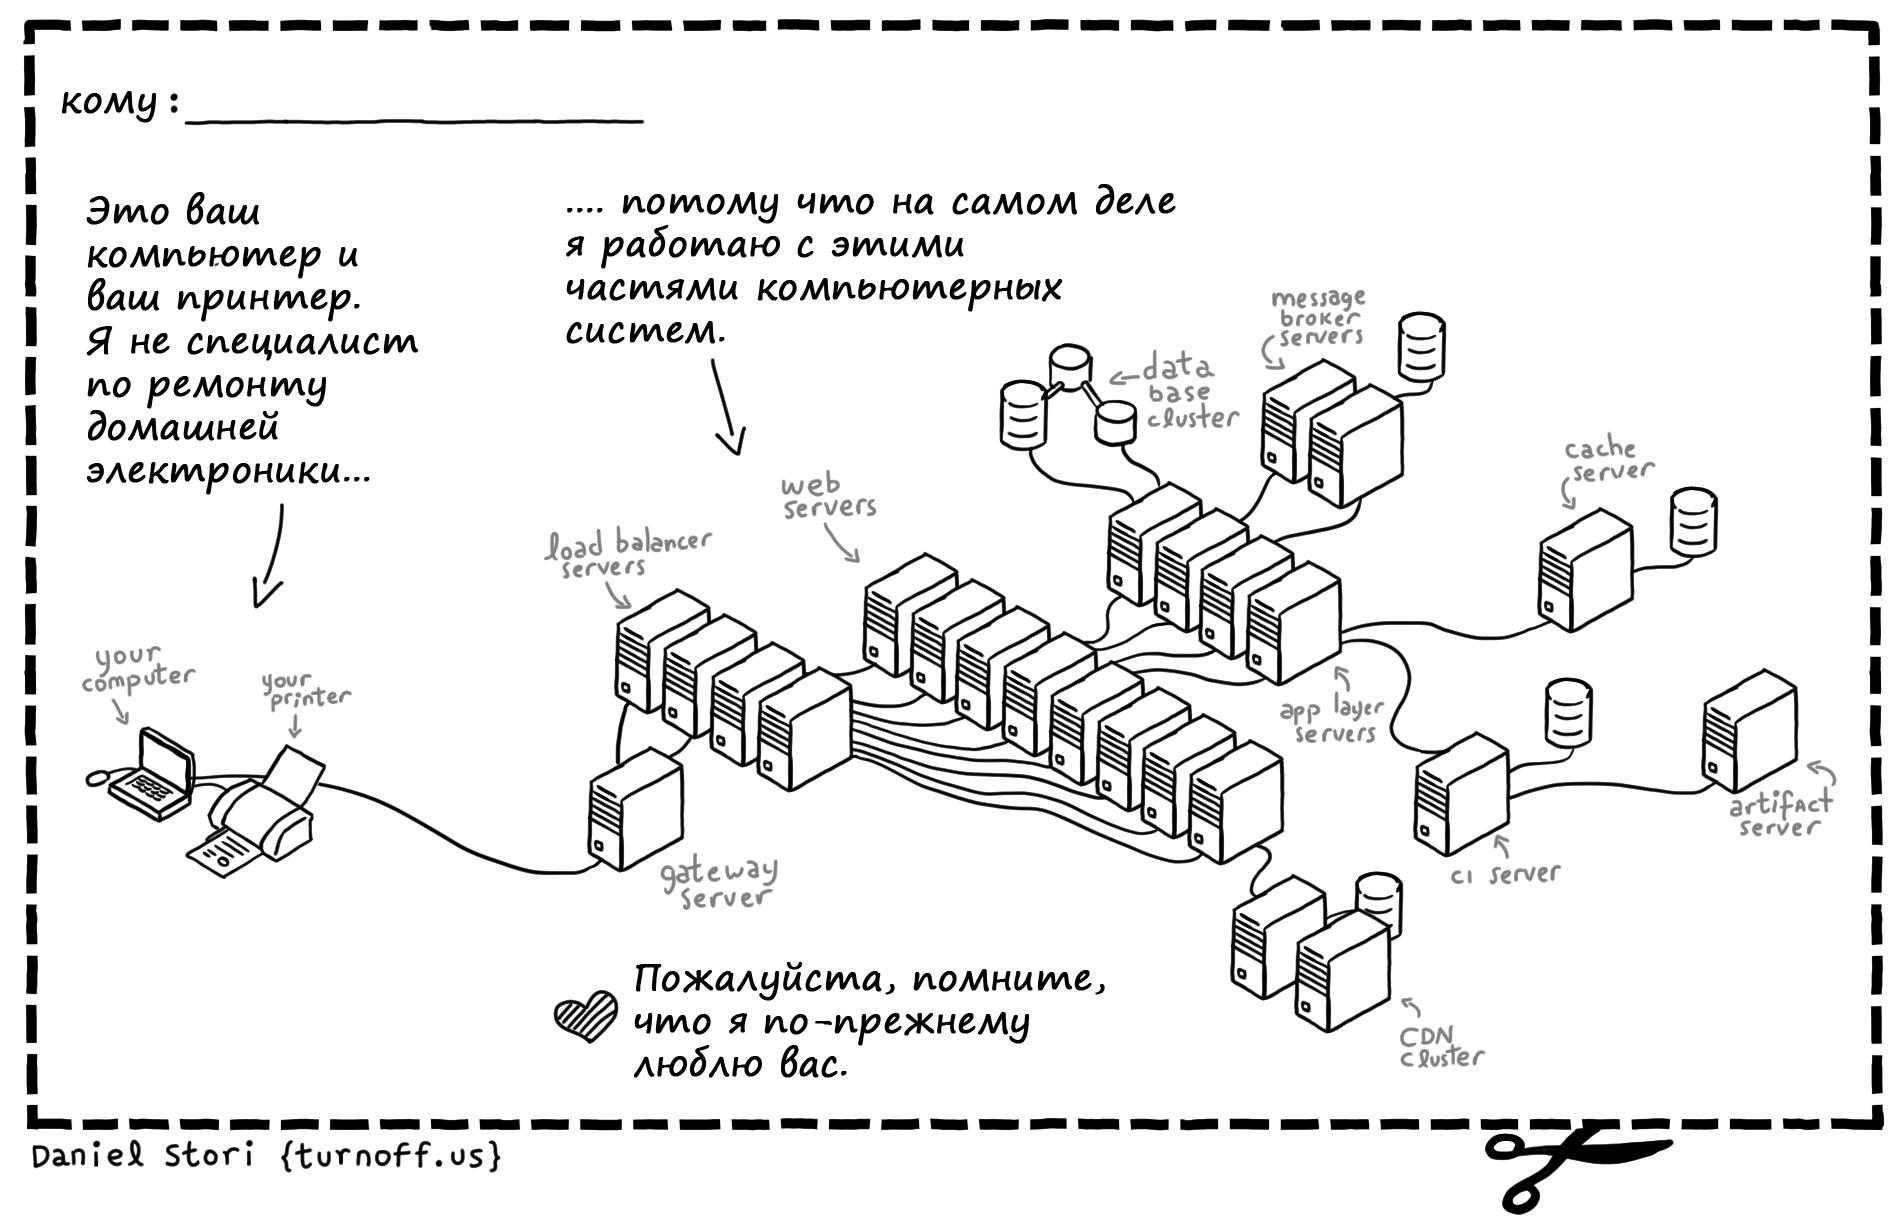 Комиксы Даниэля Стори - 22